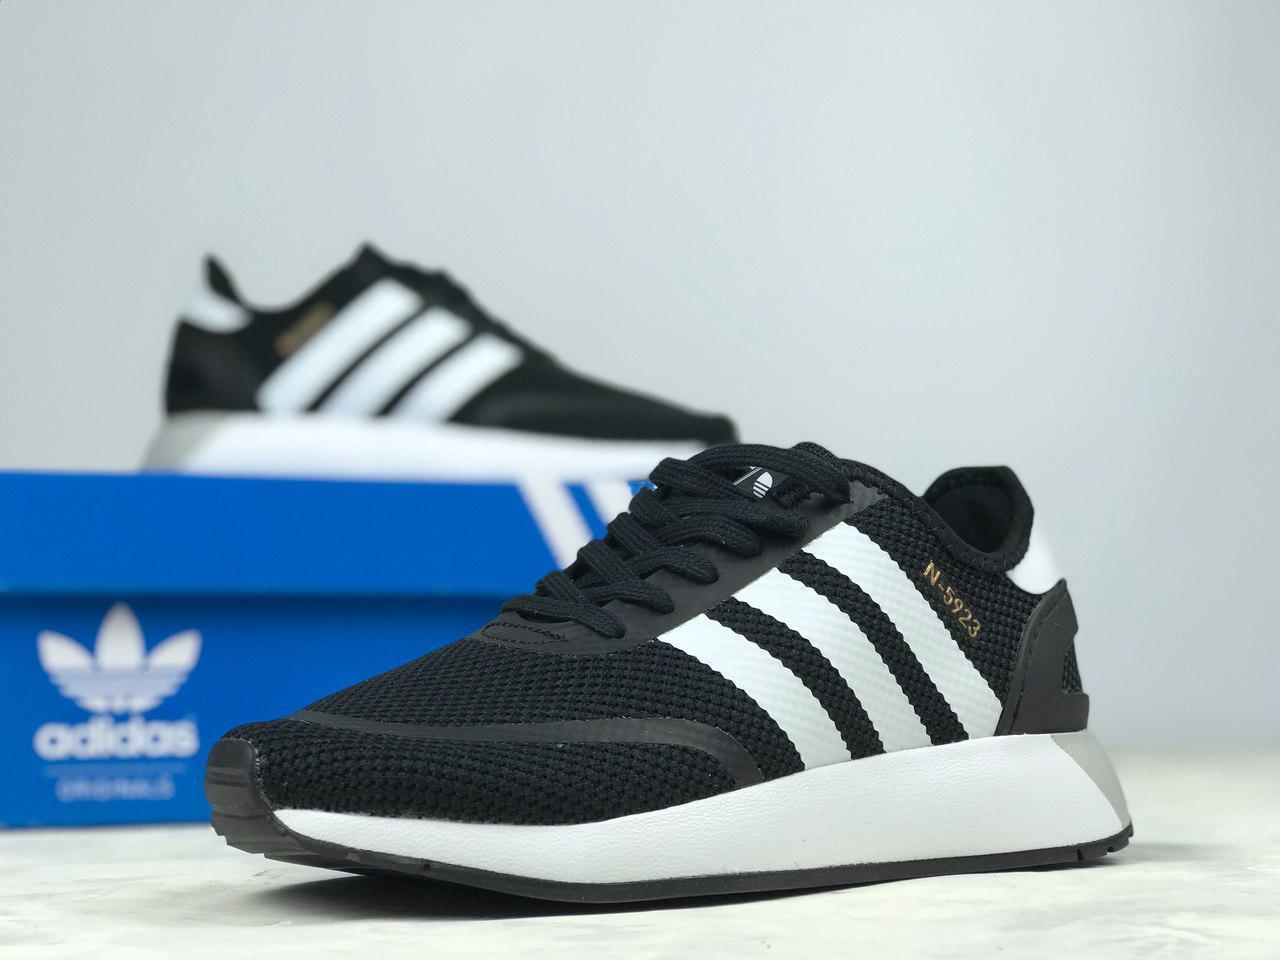 10e9de68e8fc Adidas N-5923 Black   кроссовки женские и мужские  летние  черно-белые